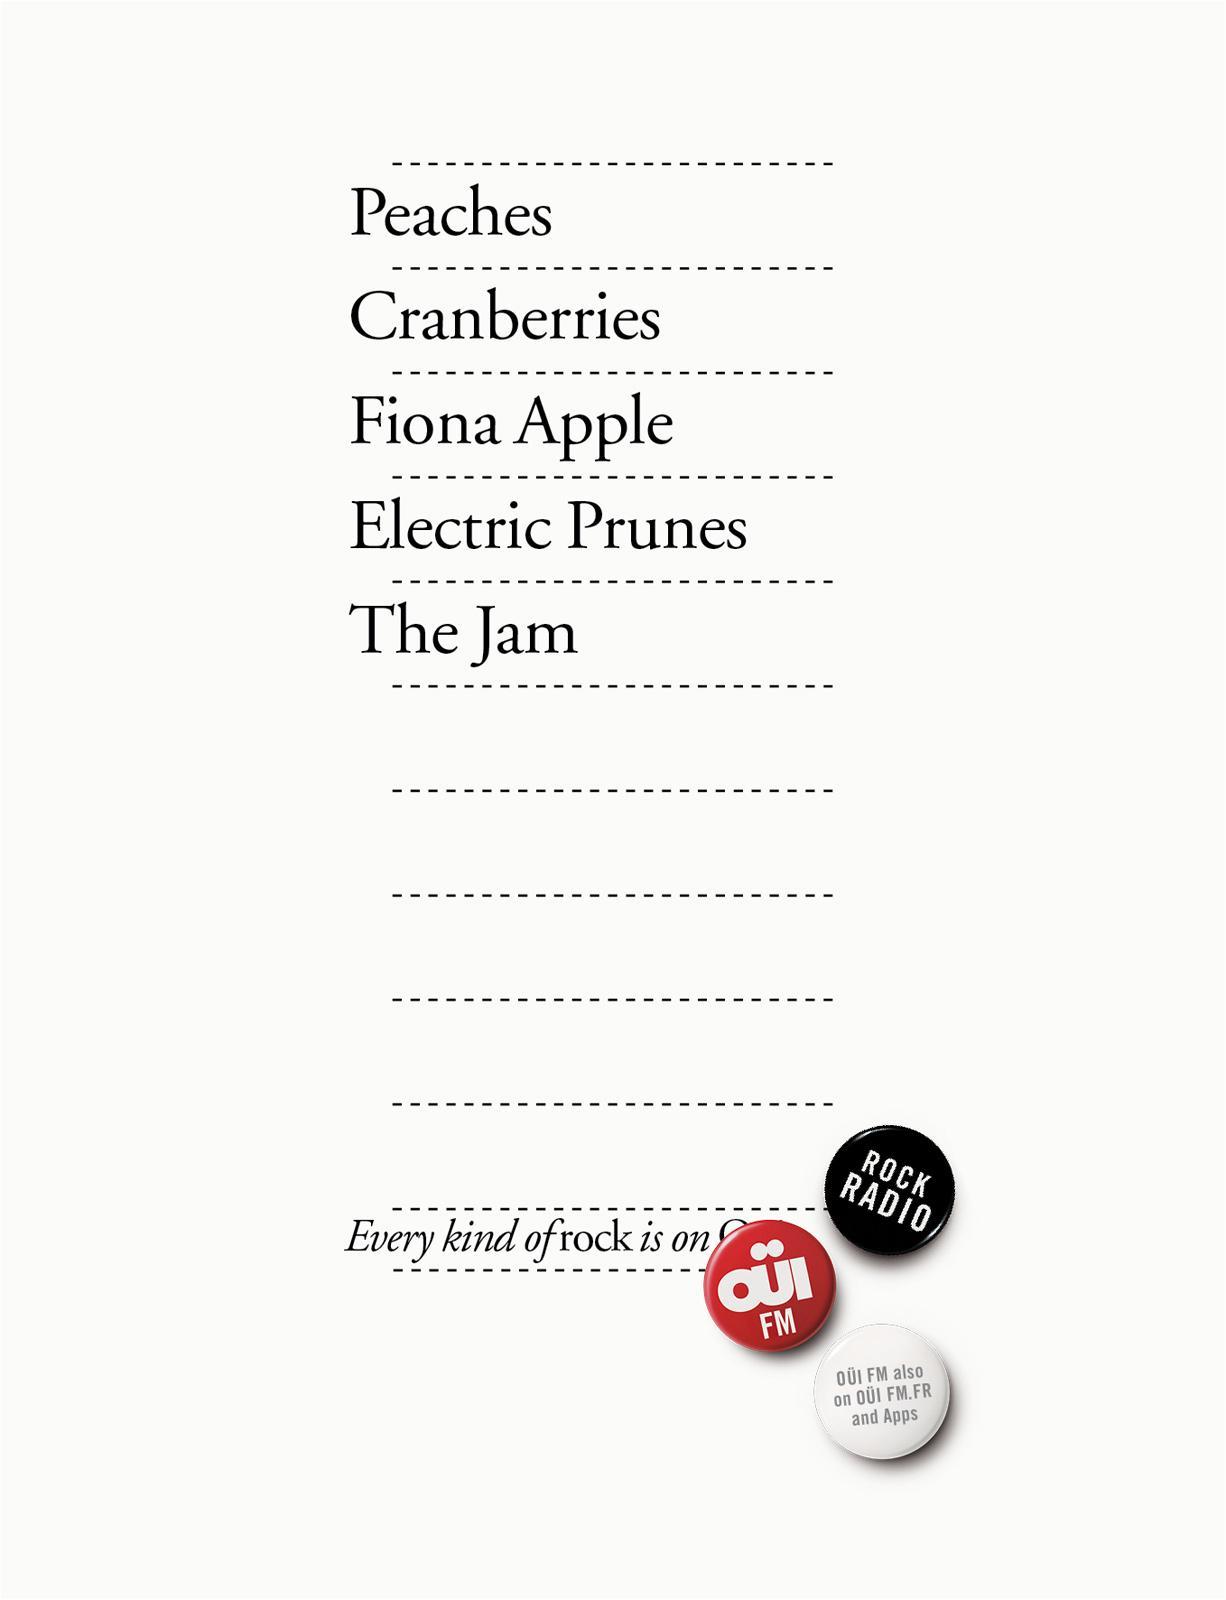 Oui FM Print Ad -  Every kind of rock, 6